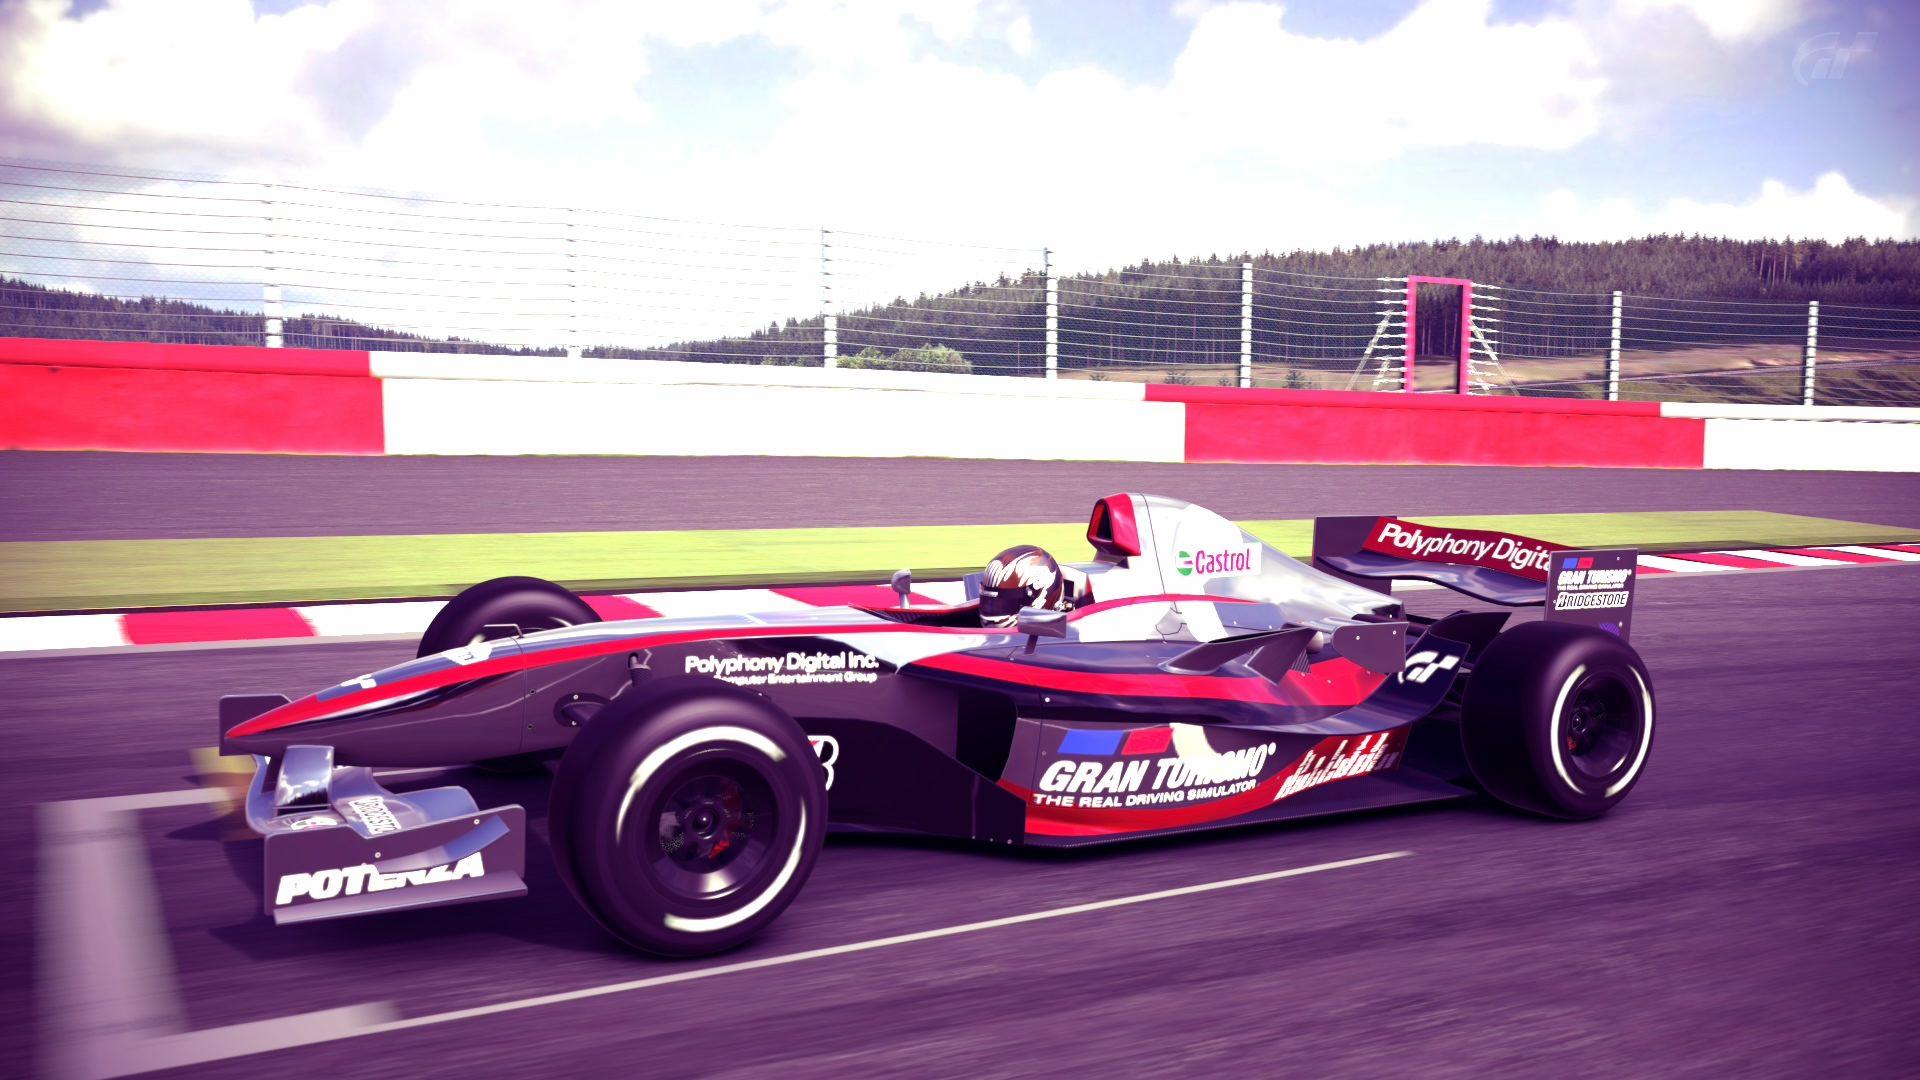 Circuit de Spa-Francorchamps_39 (2).jpg